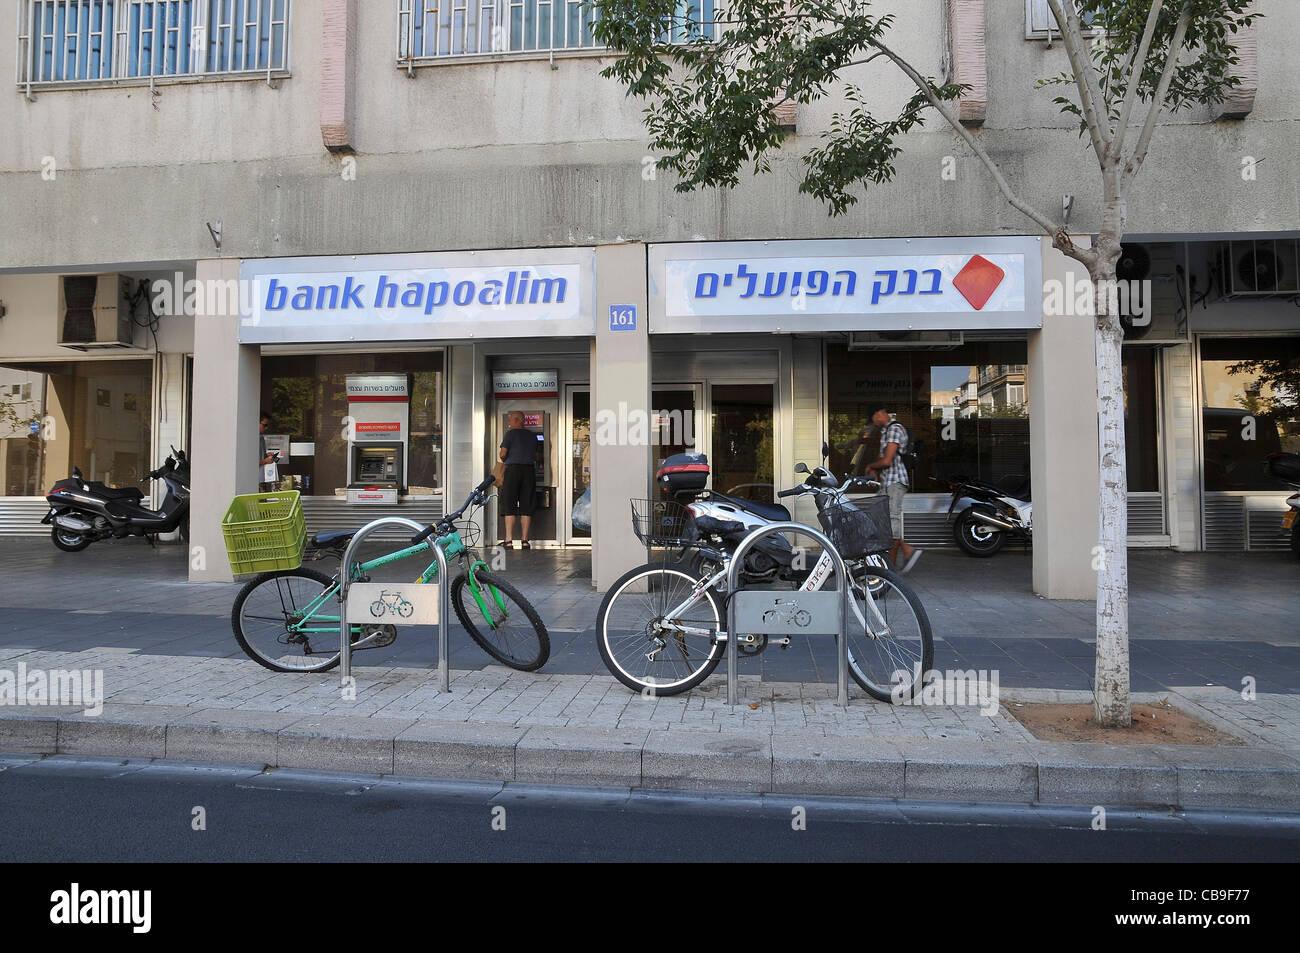 Israel, Tel Aviv, A brach of Bank Hapoalim Stock Photo